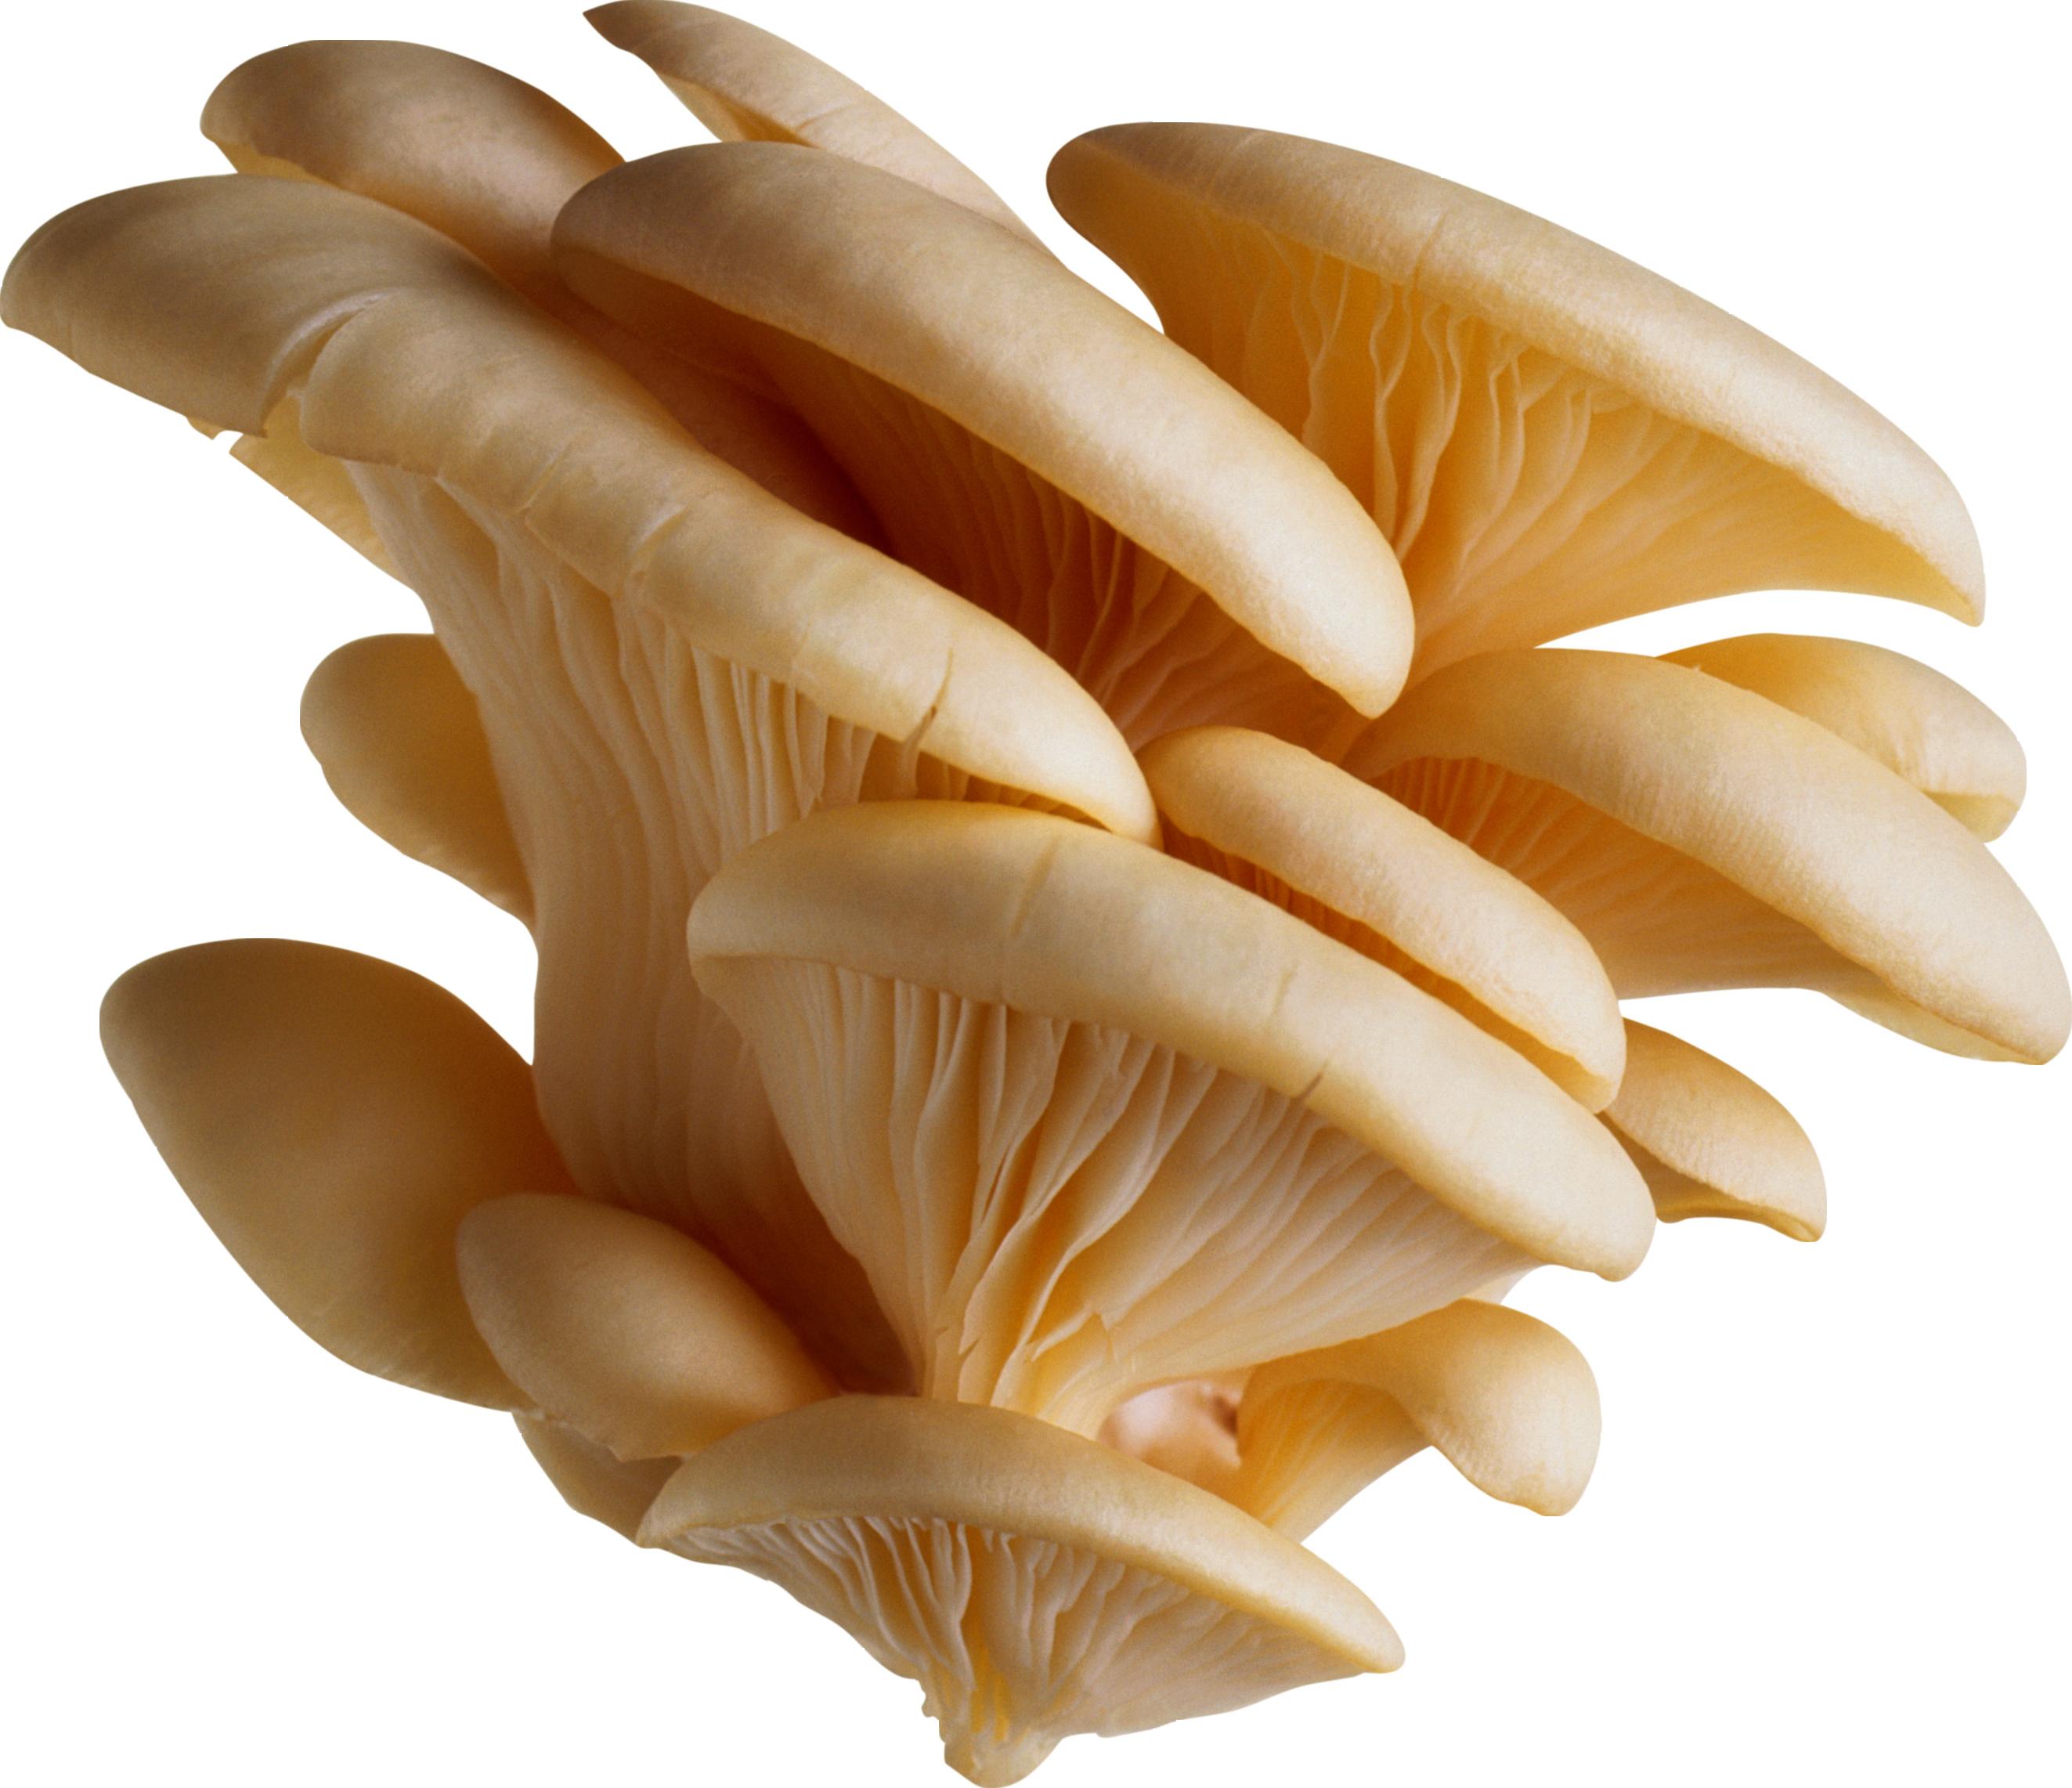 White mushrooms PNG image - Toadstool PNG HD